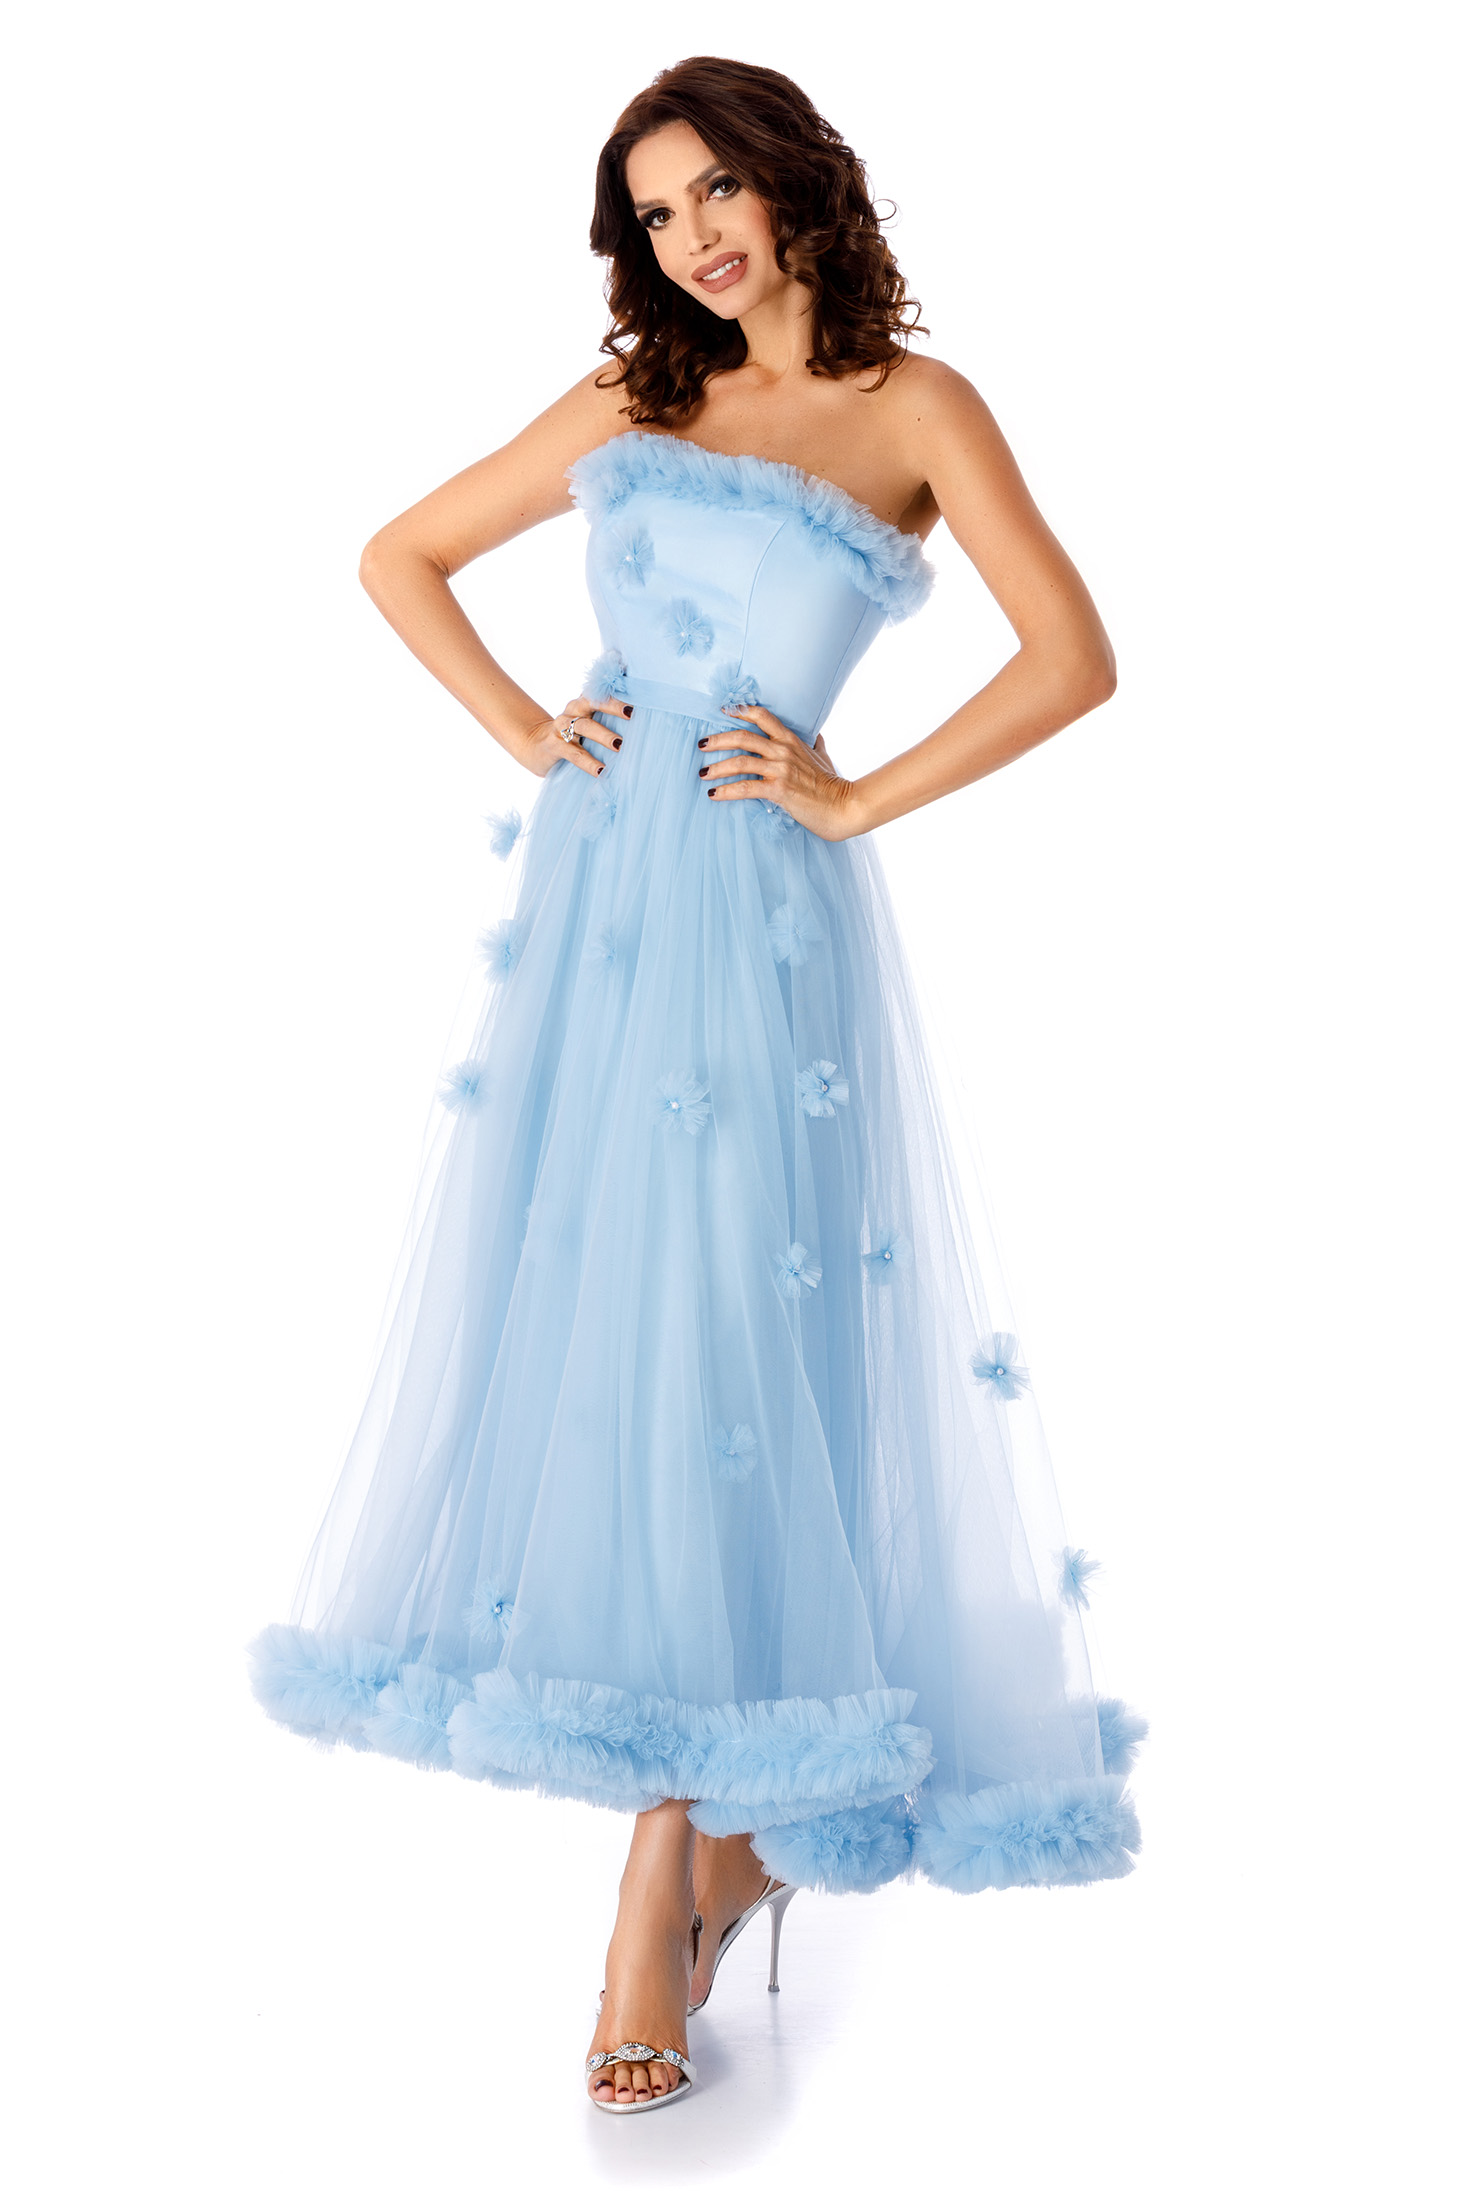 Rochie albastru-deschis de ocazie lunga in clos cu umeri goi croi in clos